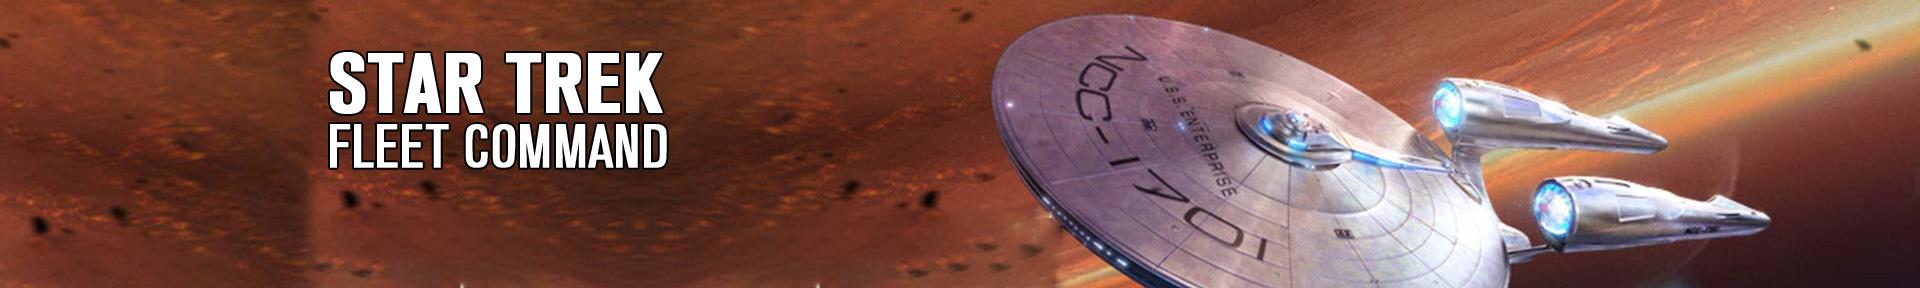 Star Trek Fleet Commander Latinum